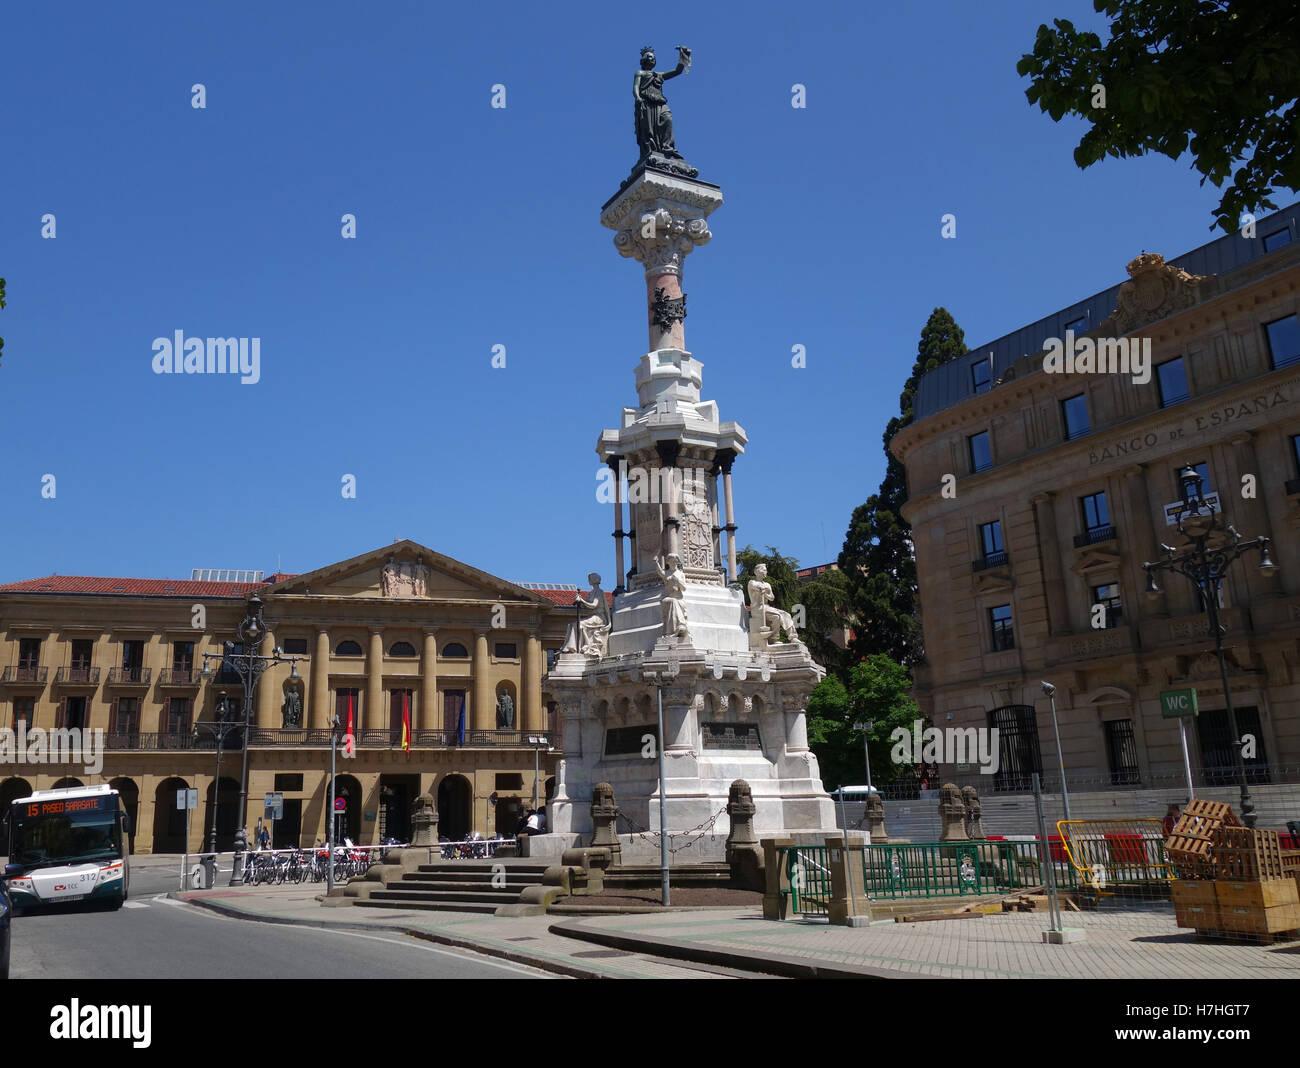 Pamplona in Navarre provence Spain Stock Photo